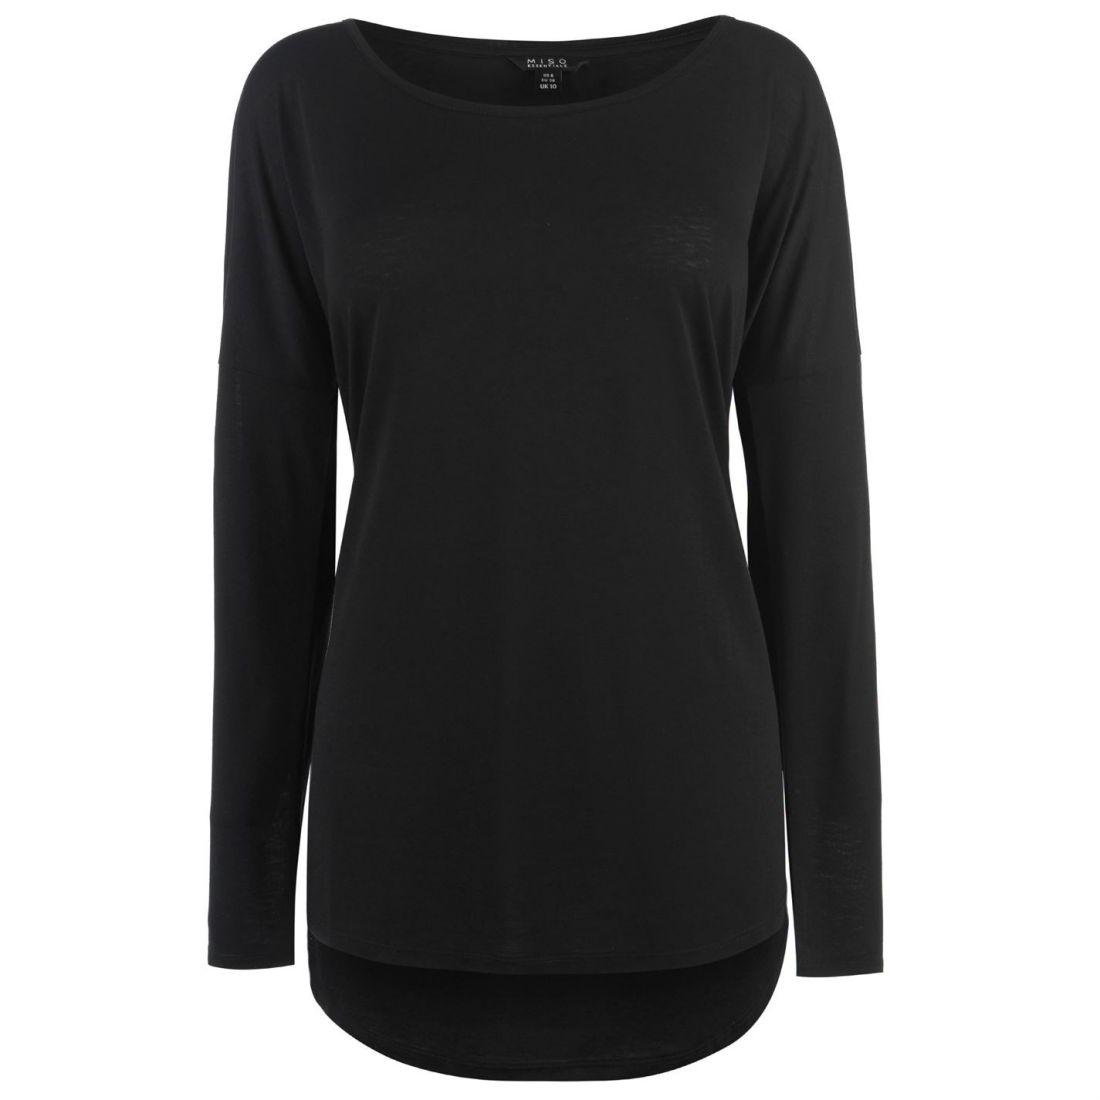 8304cb4b6de6f9 Miso Womens Long Length Shirt Sleeve Scoop Neck Loose Fit | eBay